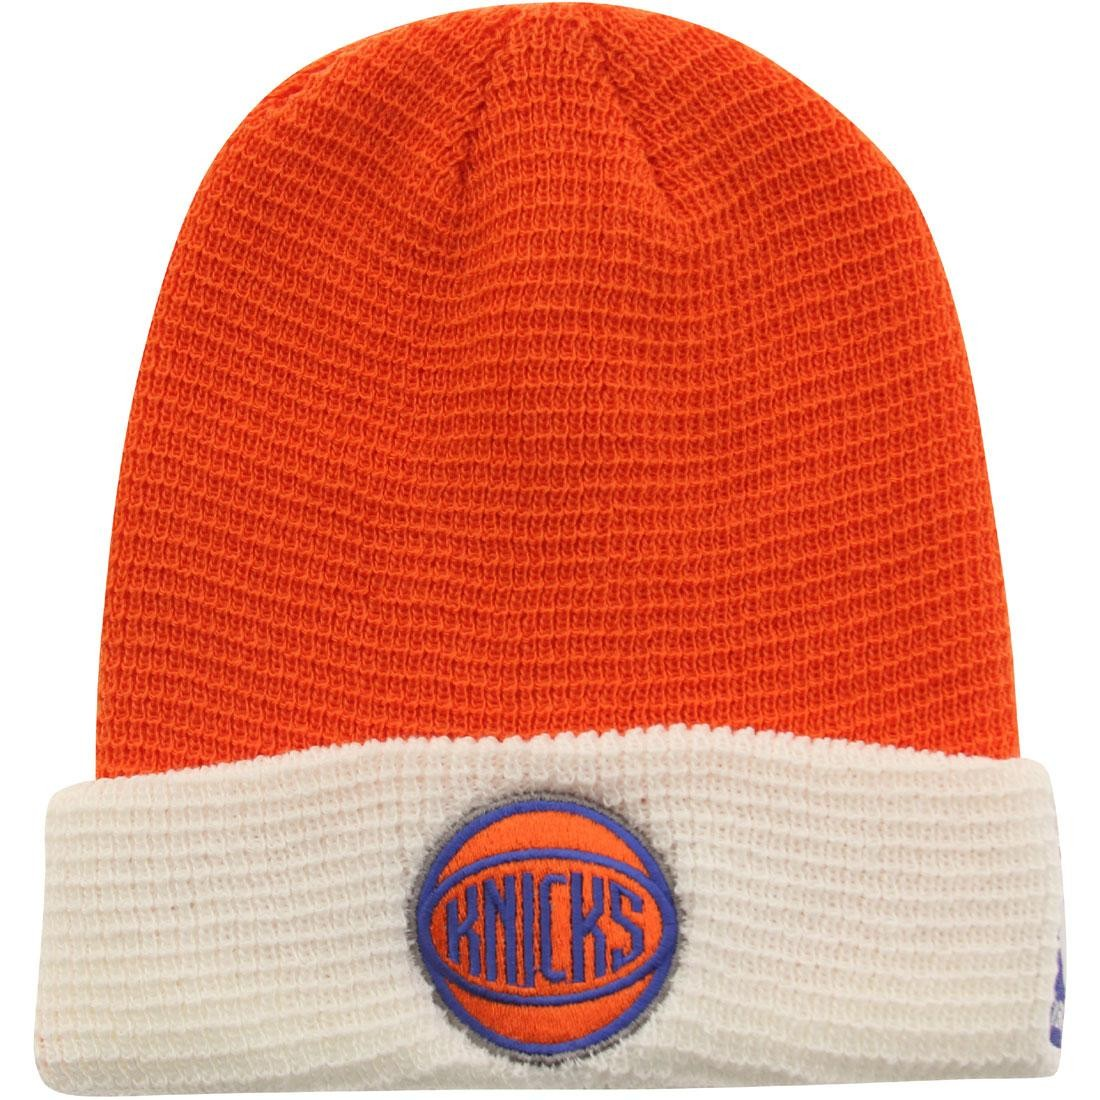 fea515237 Adidas NBA New York Knicks Team Cuffed Knit Beanie (orange / white)